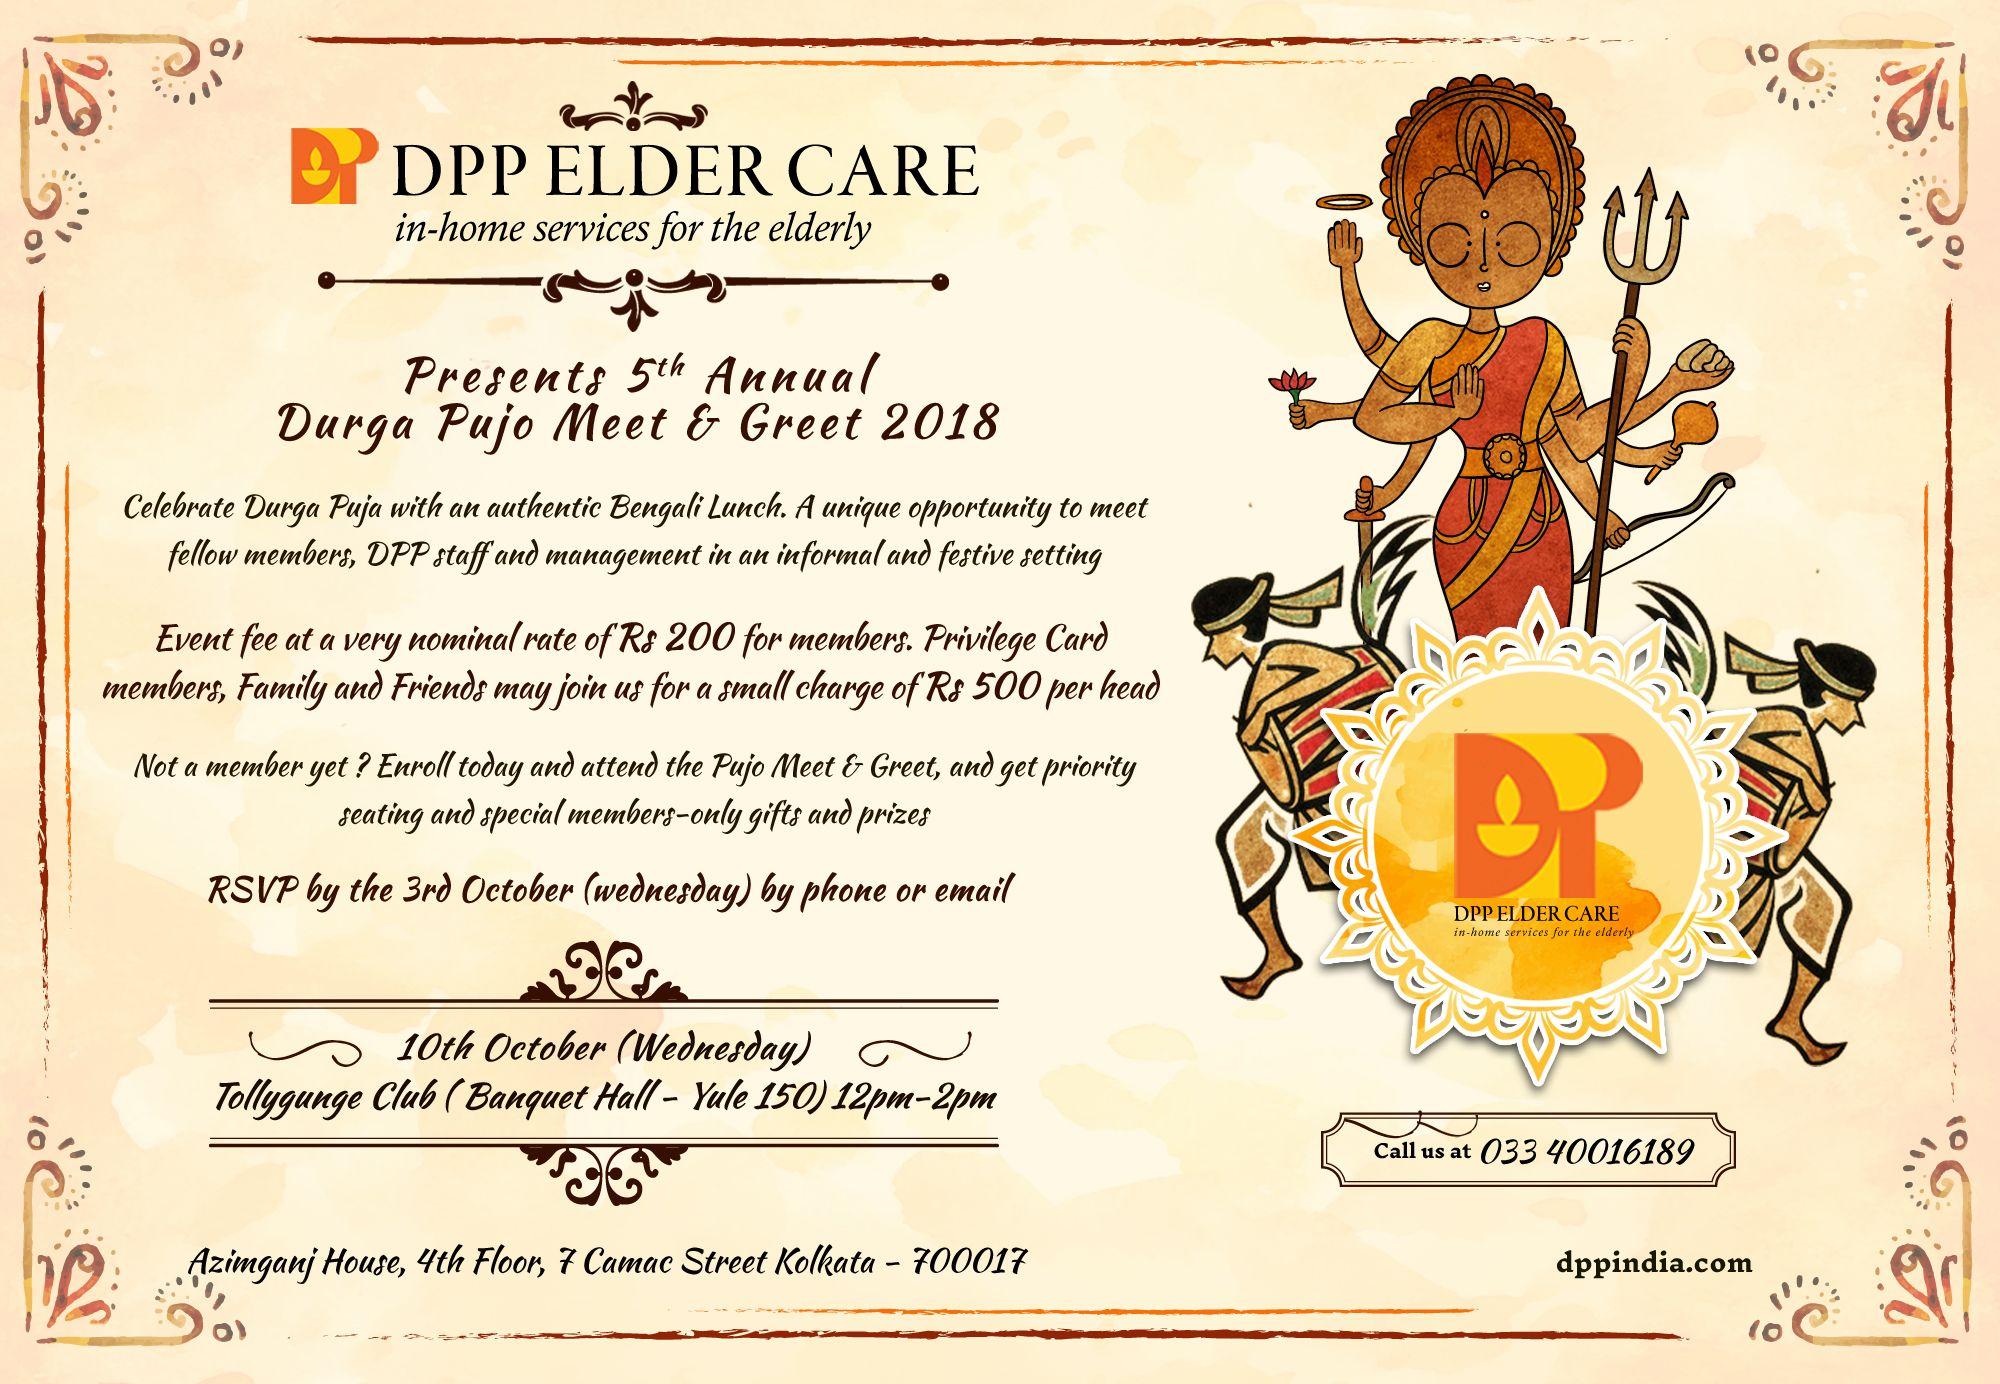 Durga Puja Meet And Greet 2018 Dpp Elder Care Dpp Elder Care